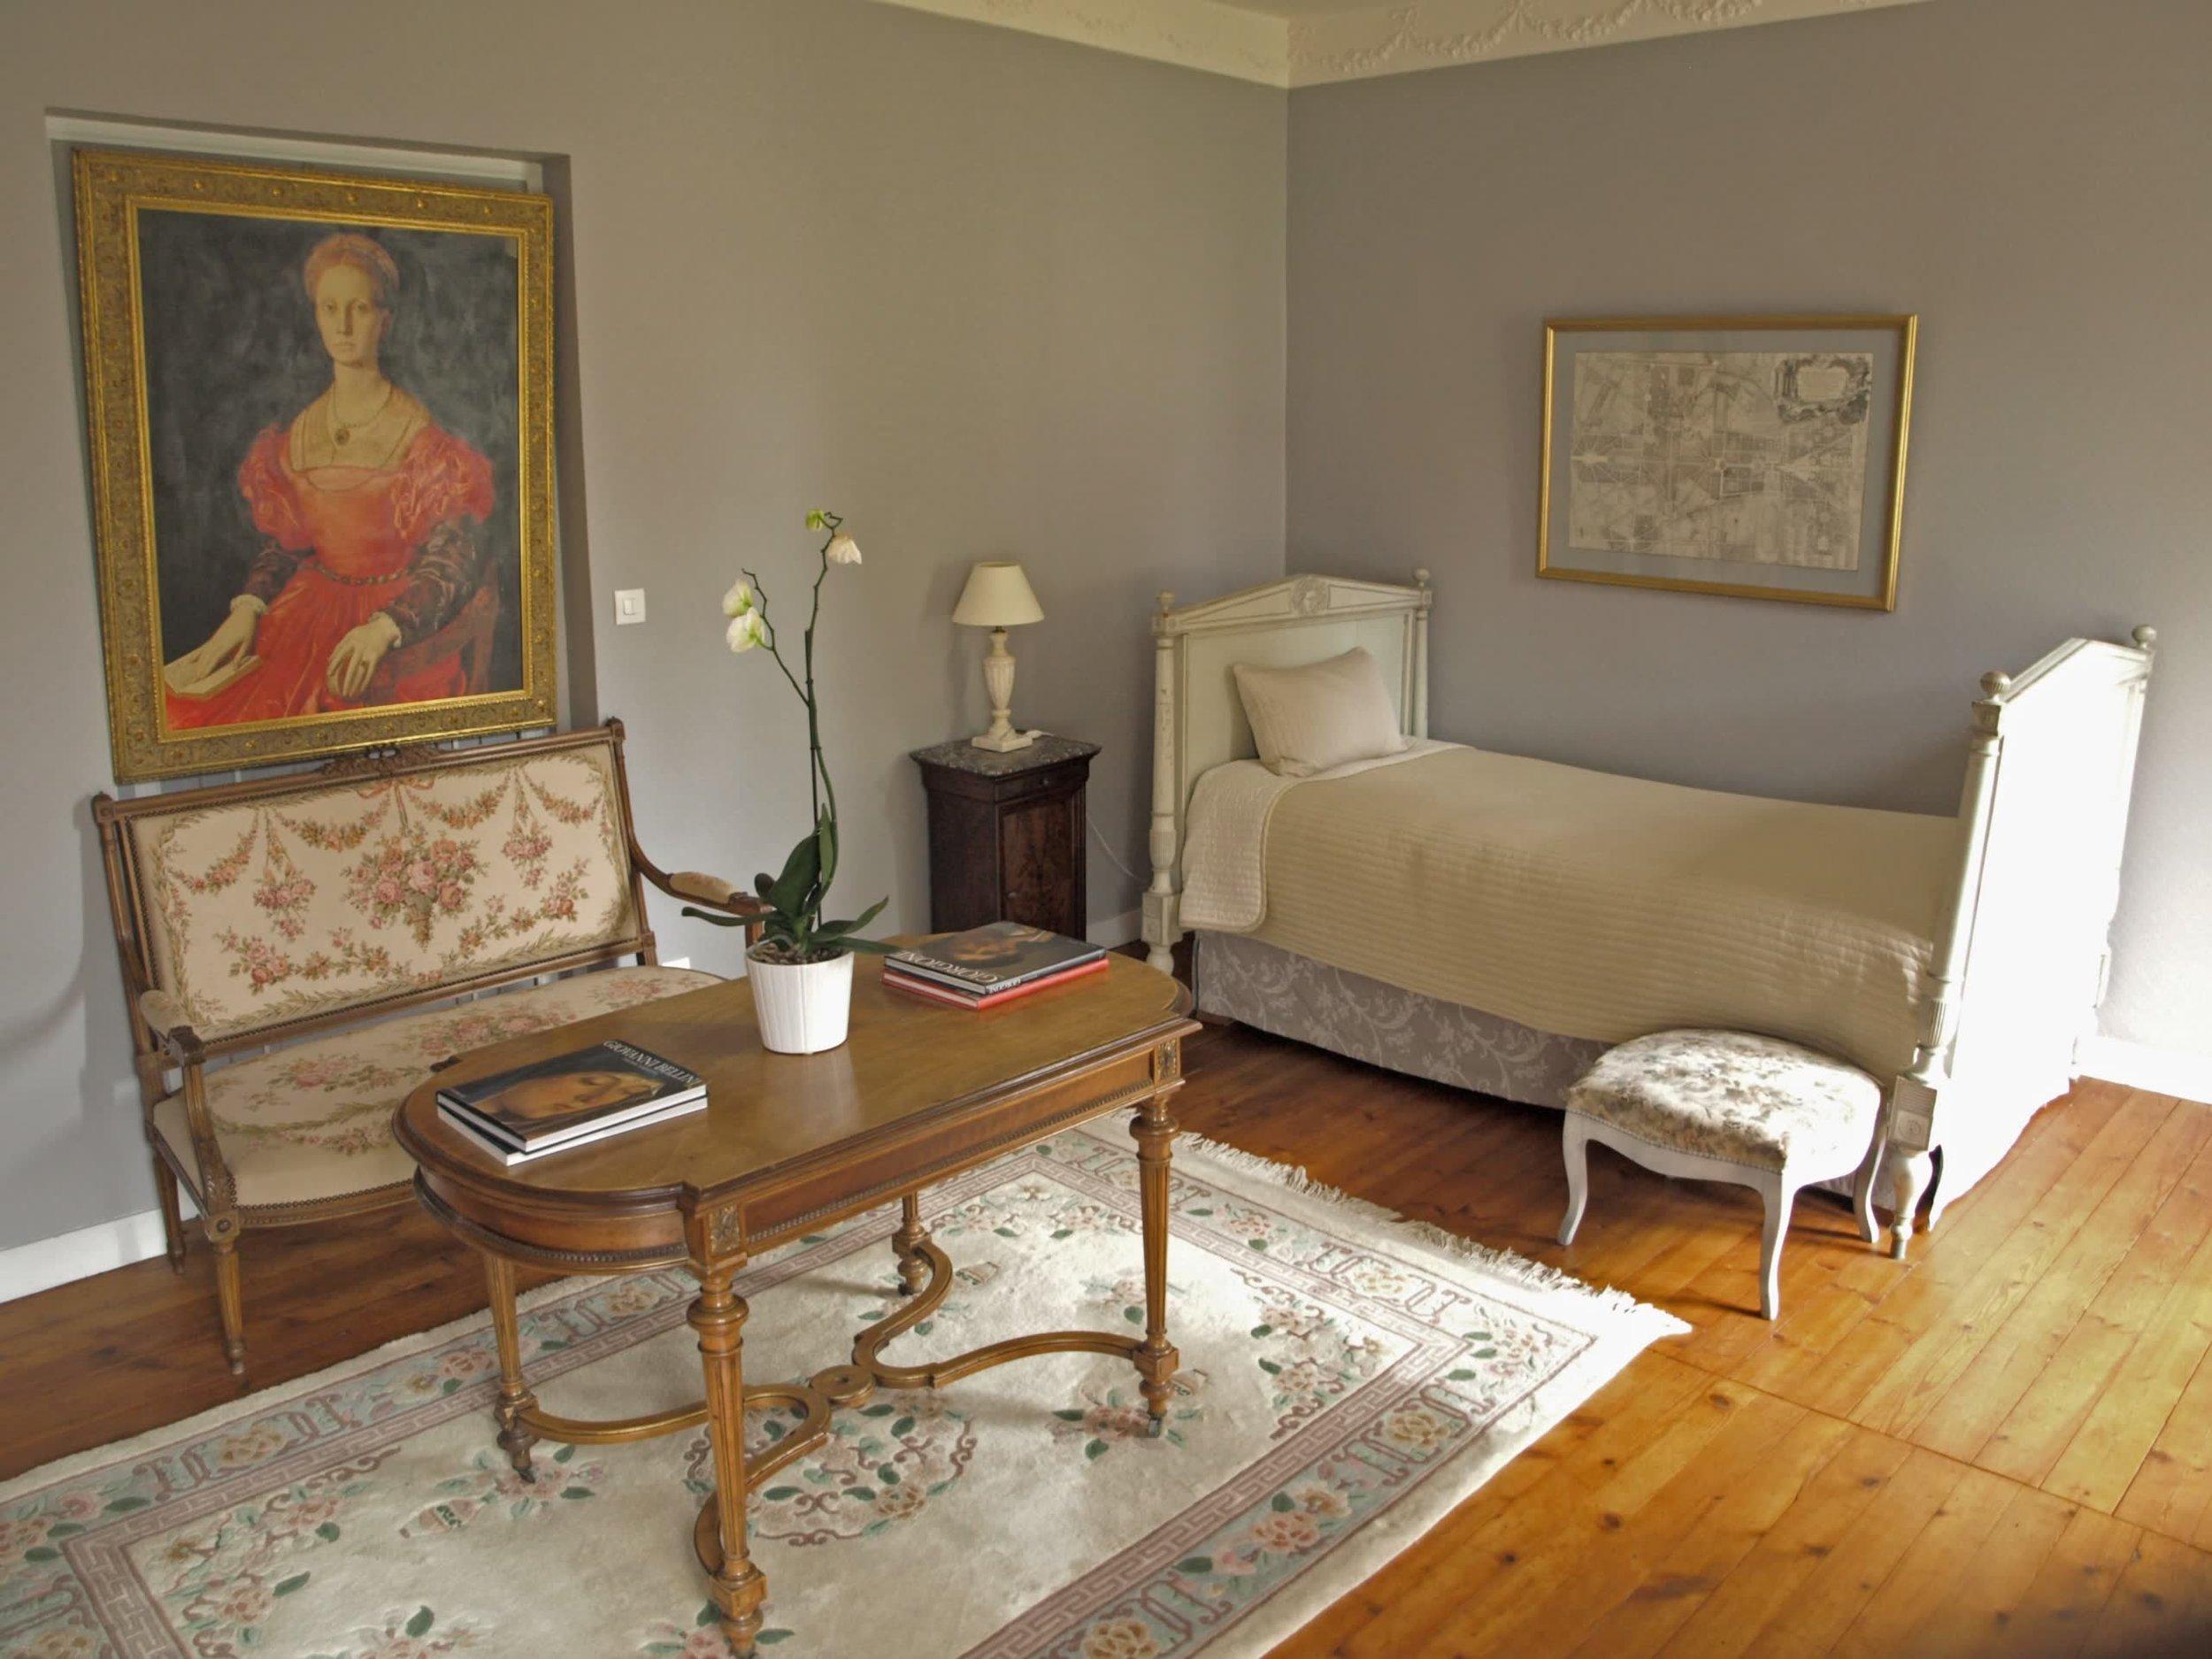 Chateau de la Pommeraye - charming boutique hotel chateau b&b spa normandy calvados bedroom Rubans 4(2).jpg